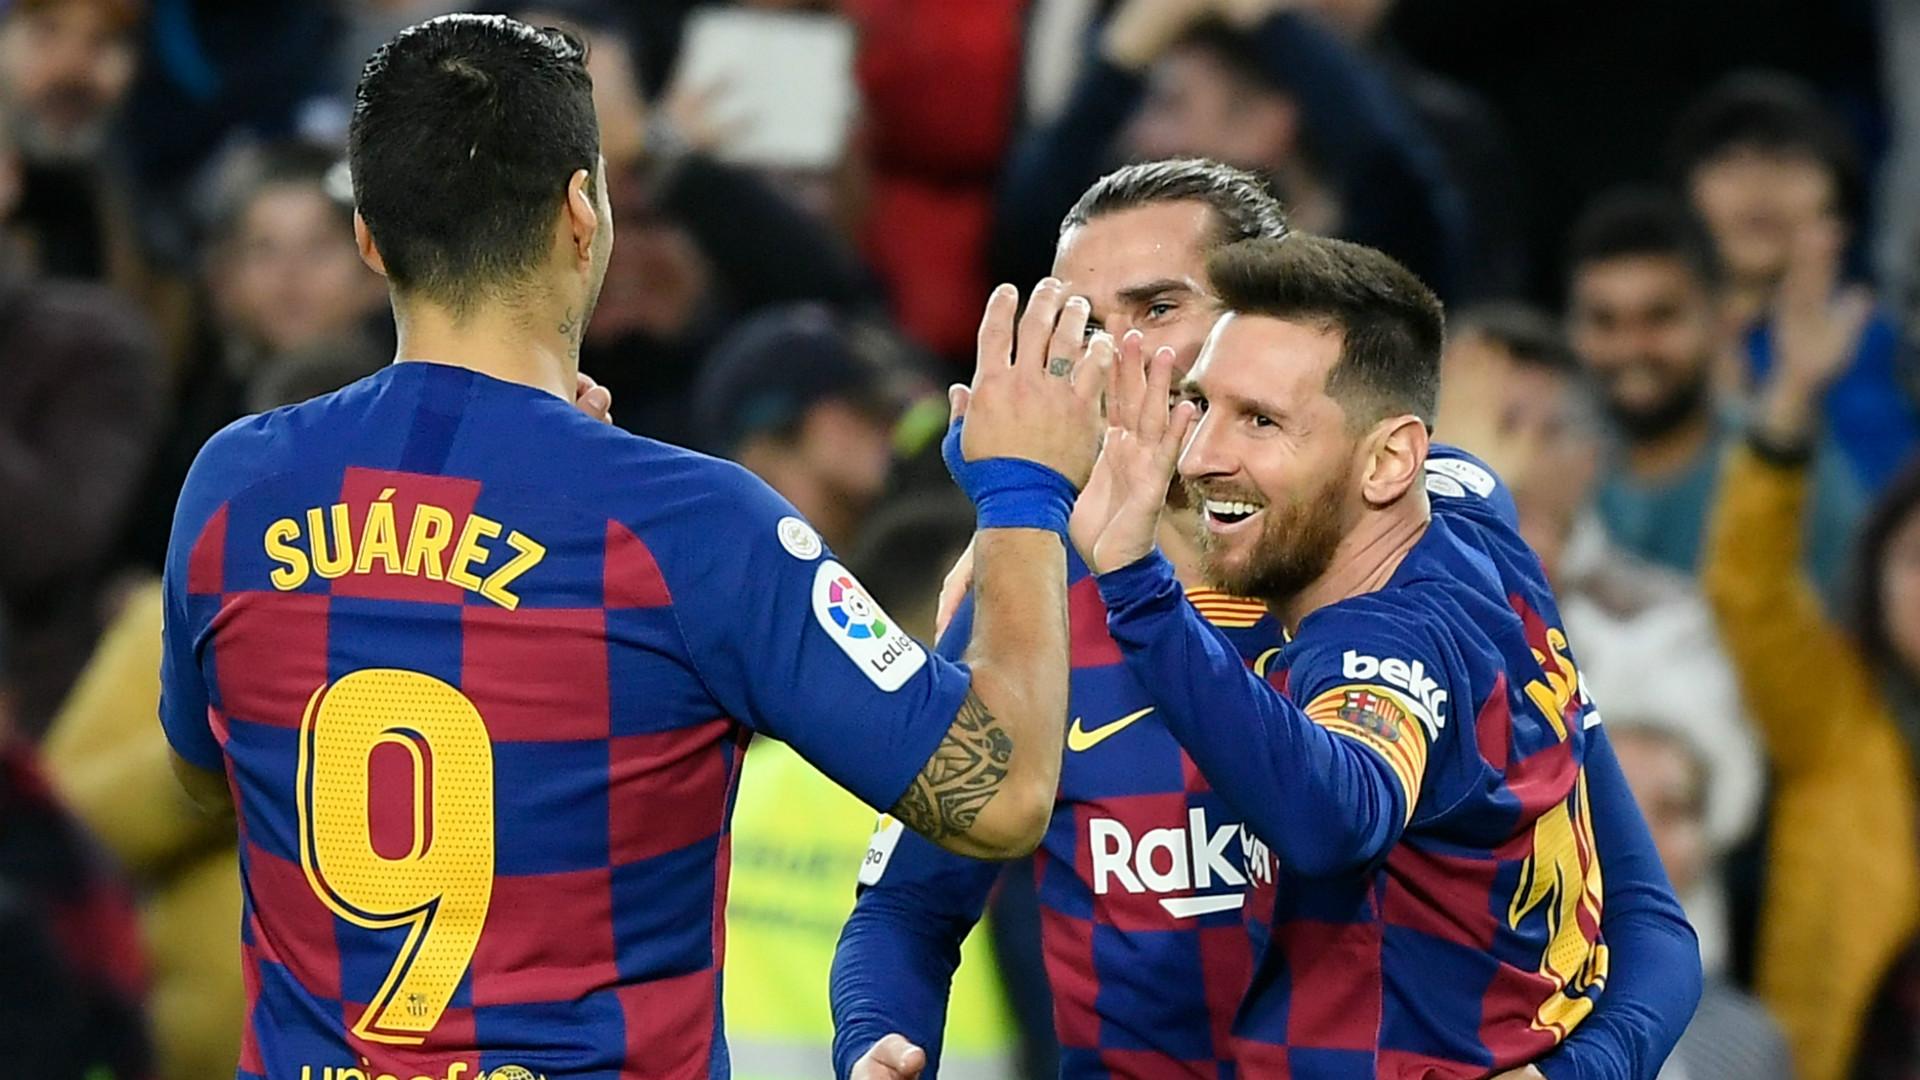 Espanyol v barcelona betting tips mnf betting preview